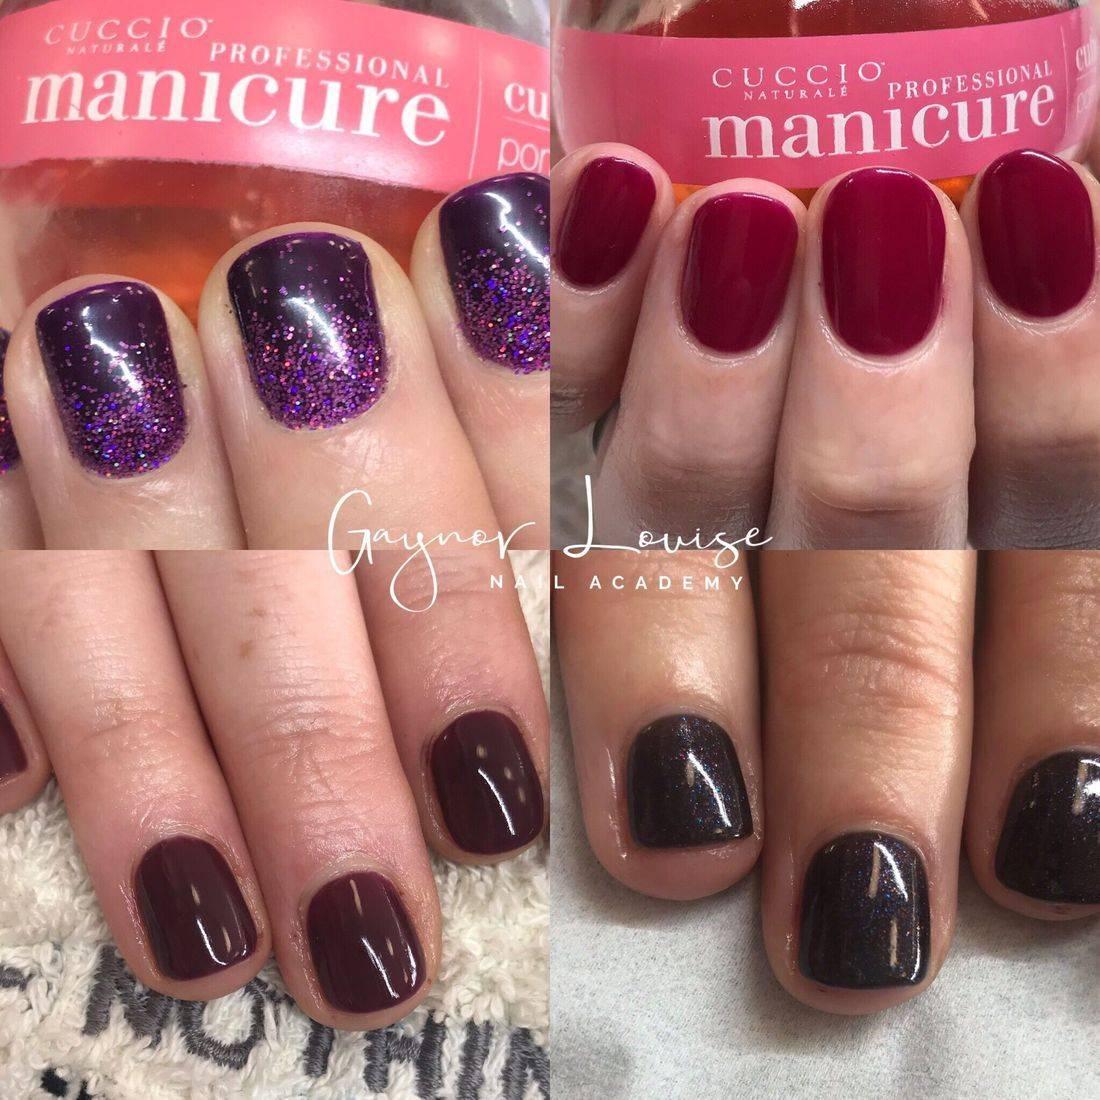 nail training, nail courses, nail training north west, bury, manchester, cuccio nail course, nail educator manchester, become a nail tecnician, gel polish training